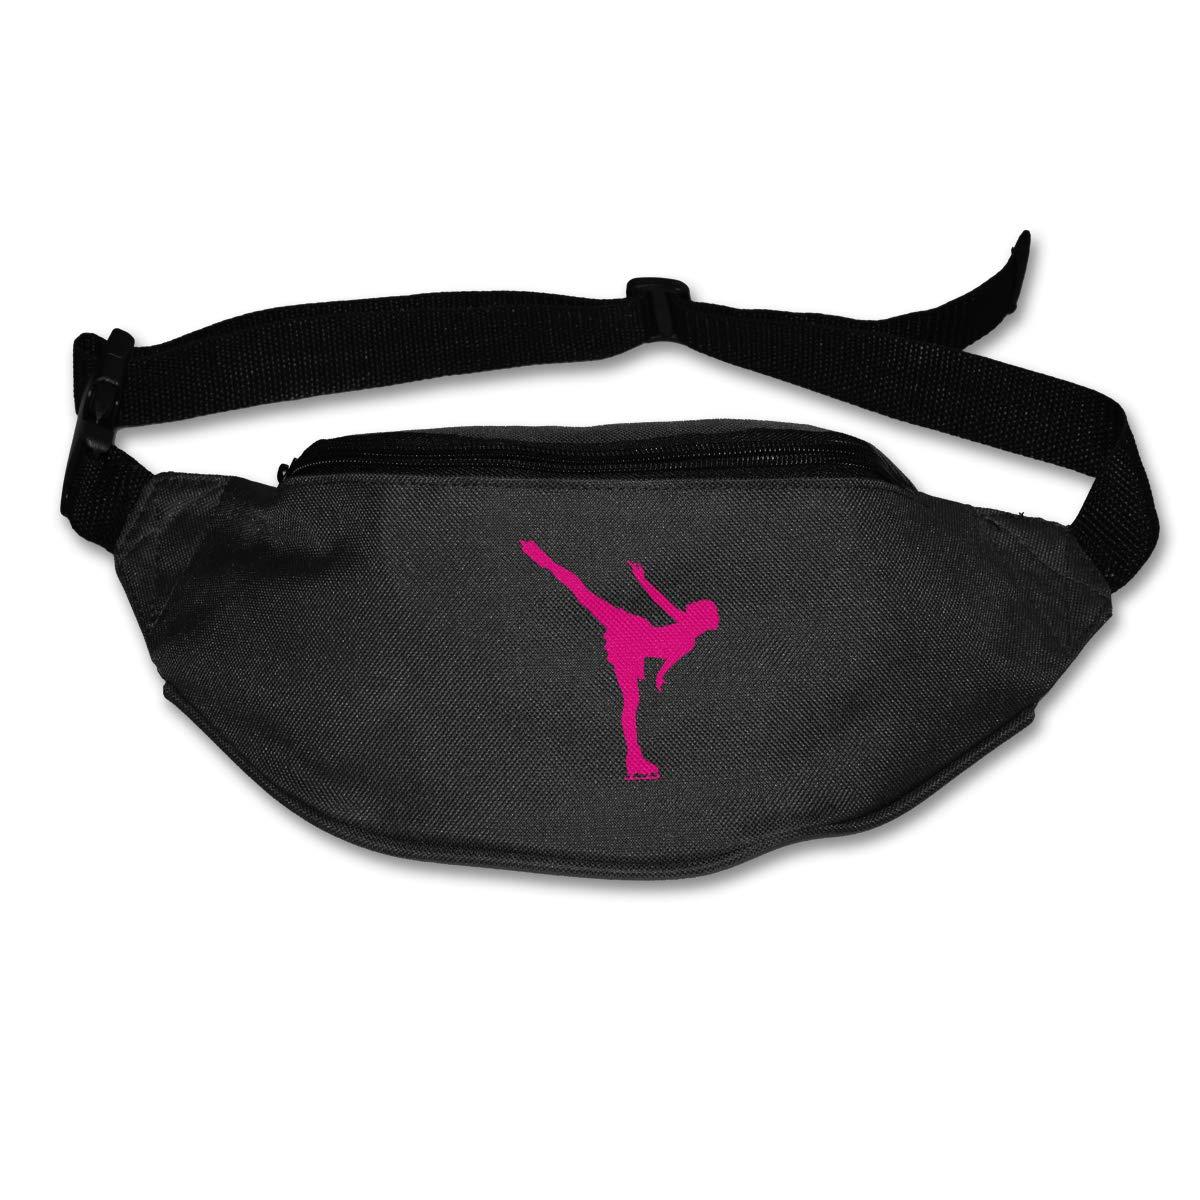 Girl Skating Sport Waist Bag Fanny Pack Adjustable For Travel